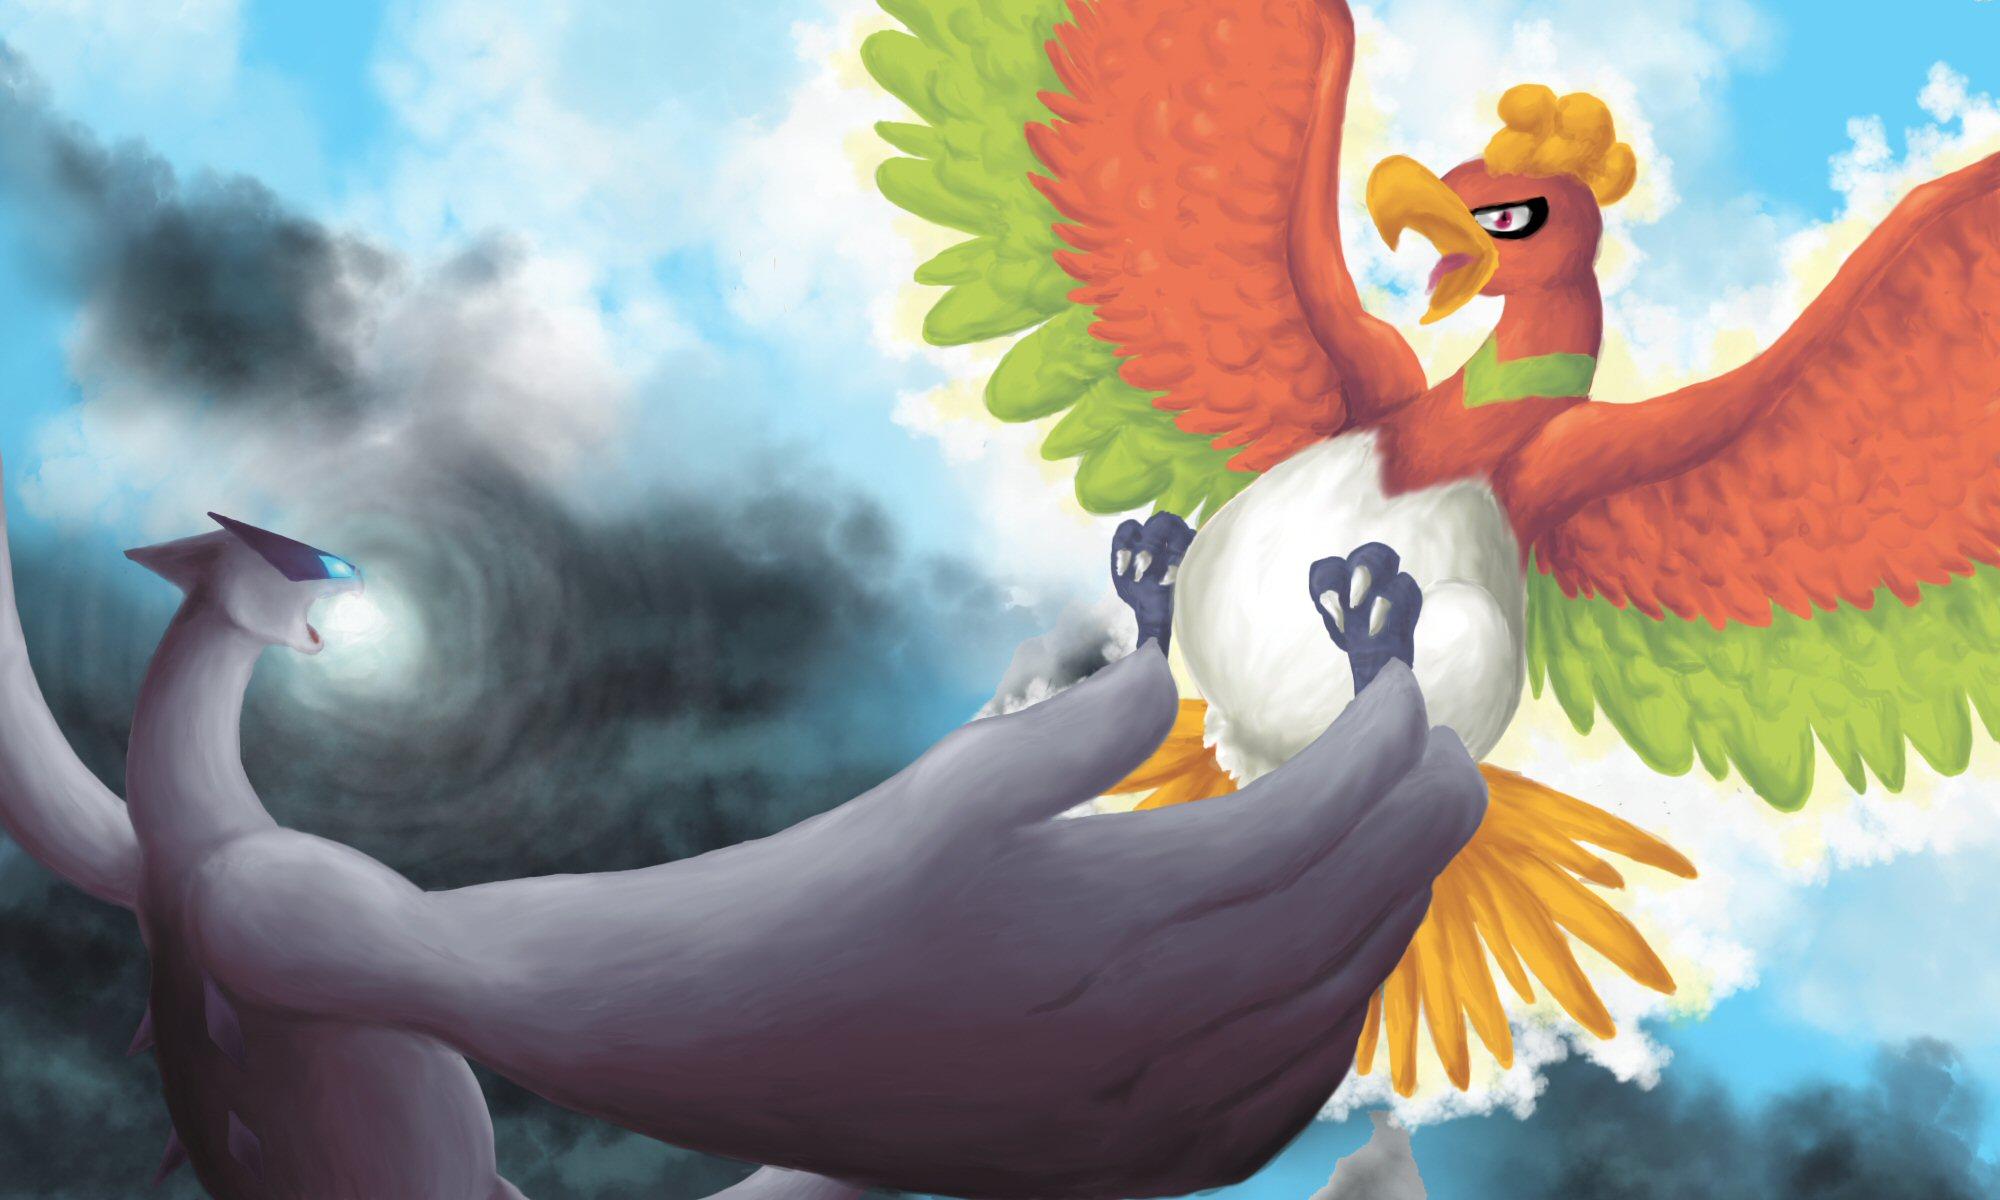 Pokémon-Zeichnung: hooh vs Lugia